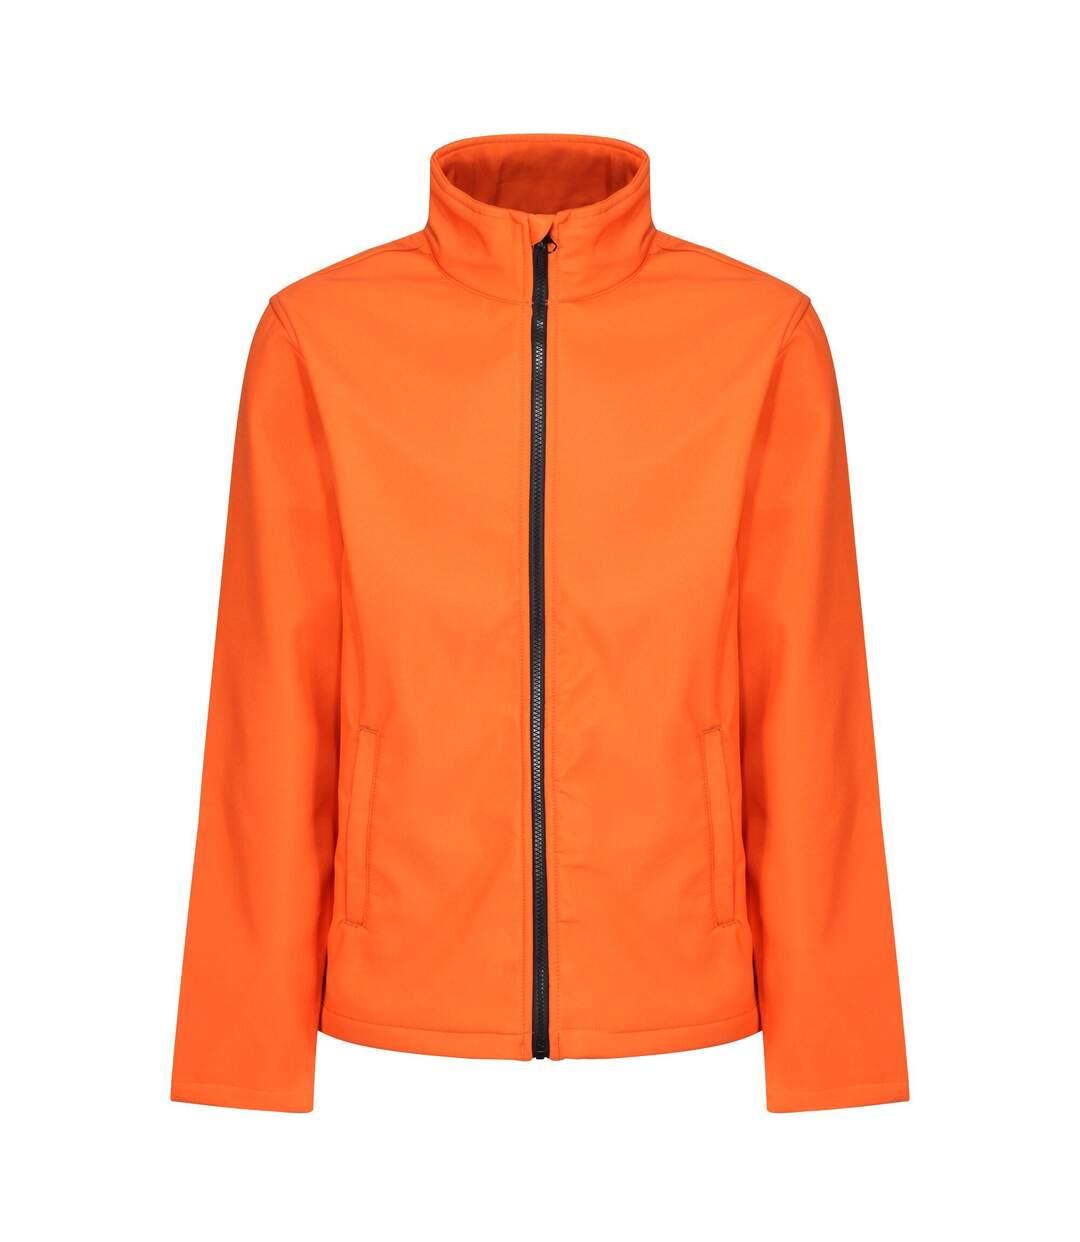 Regatta Standout Mens Ablaze Printable Soft Shell Jacket (Magma Orange/Black) - UTPC3322